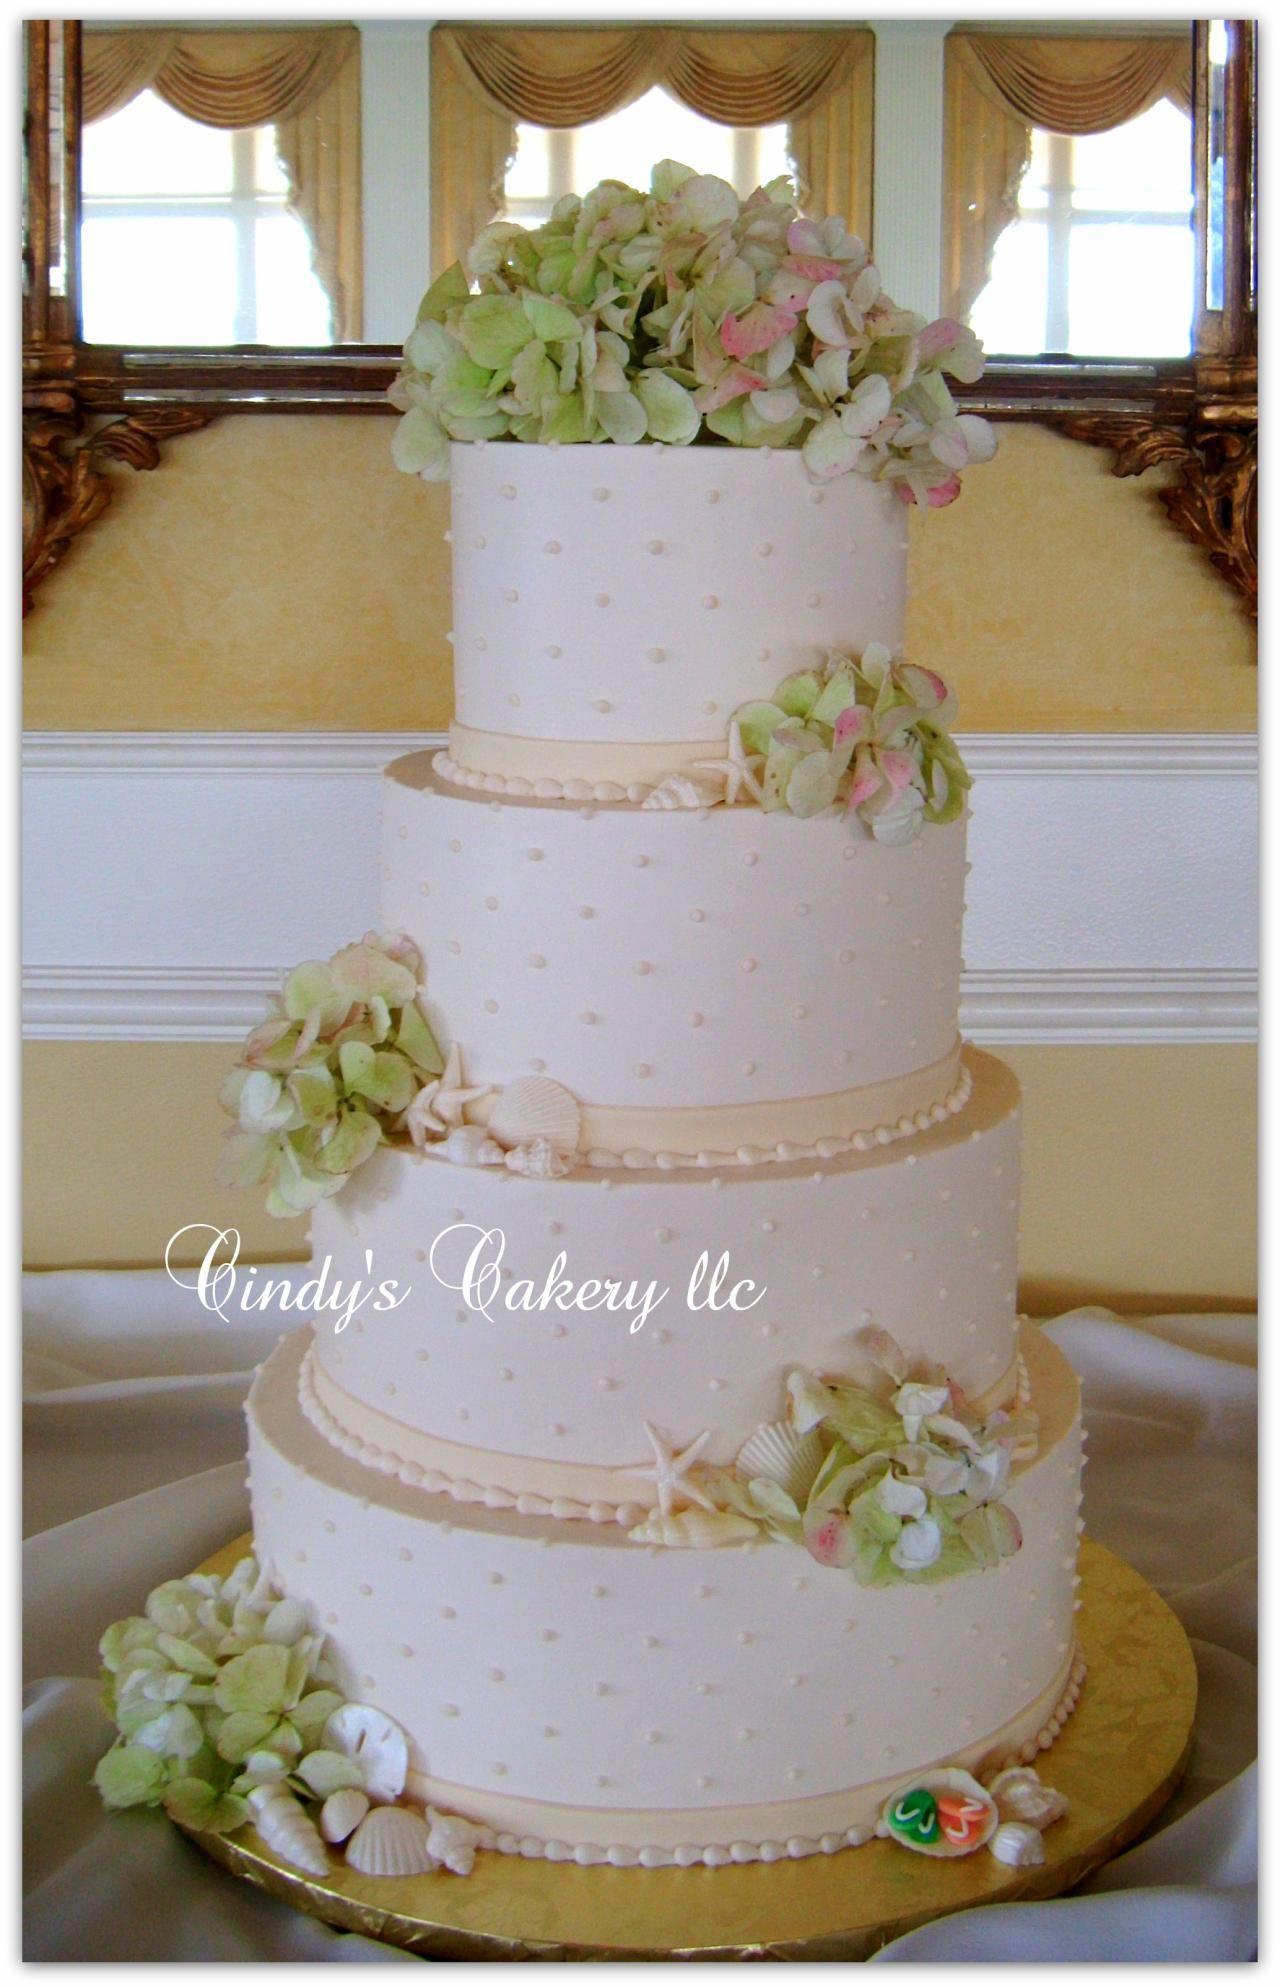 Cindy's Cakery // Buttercream swiss dots, flowers and shells elegant wedding cake with fresh hyrdrangeas//  www.cindyscakery.com // The Flower Cupboard // Two Rivers Country Club // Williamsburg Weddings